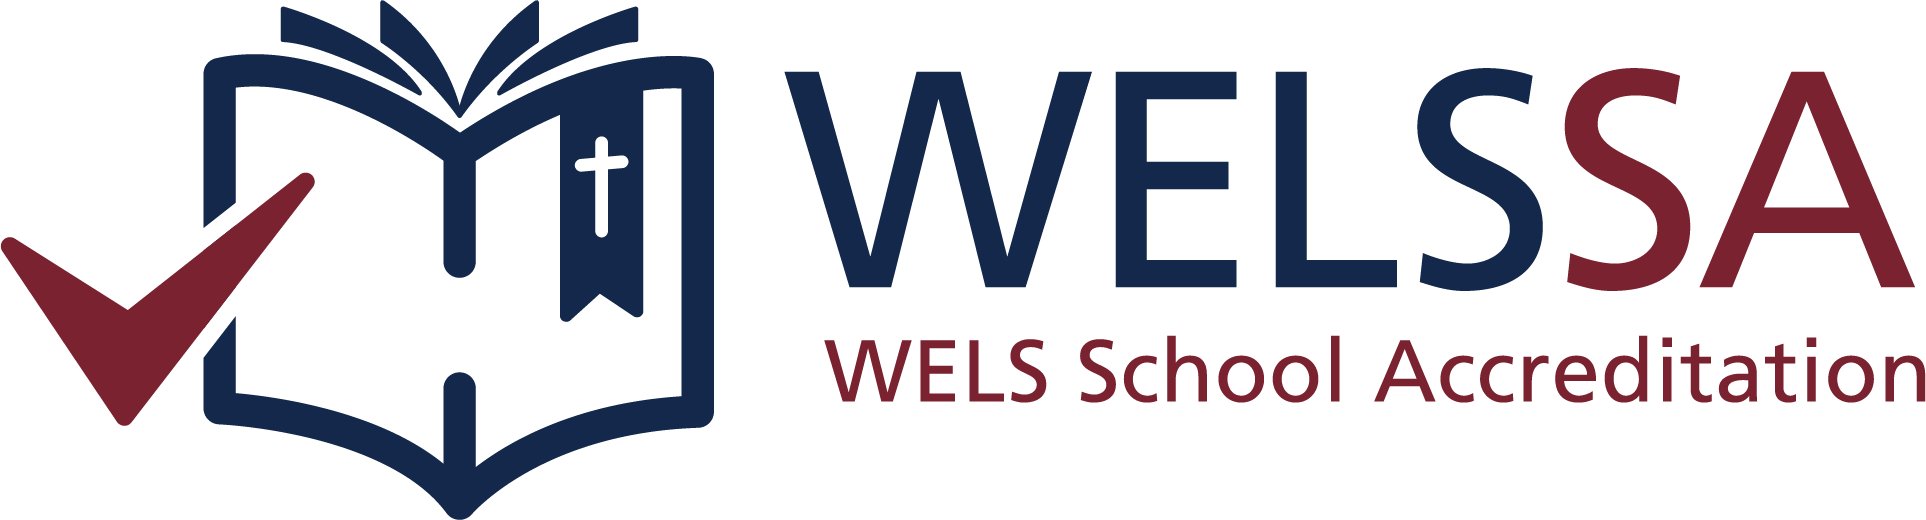 WELS School Accreditation